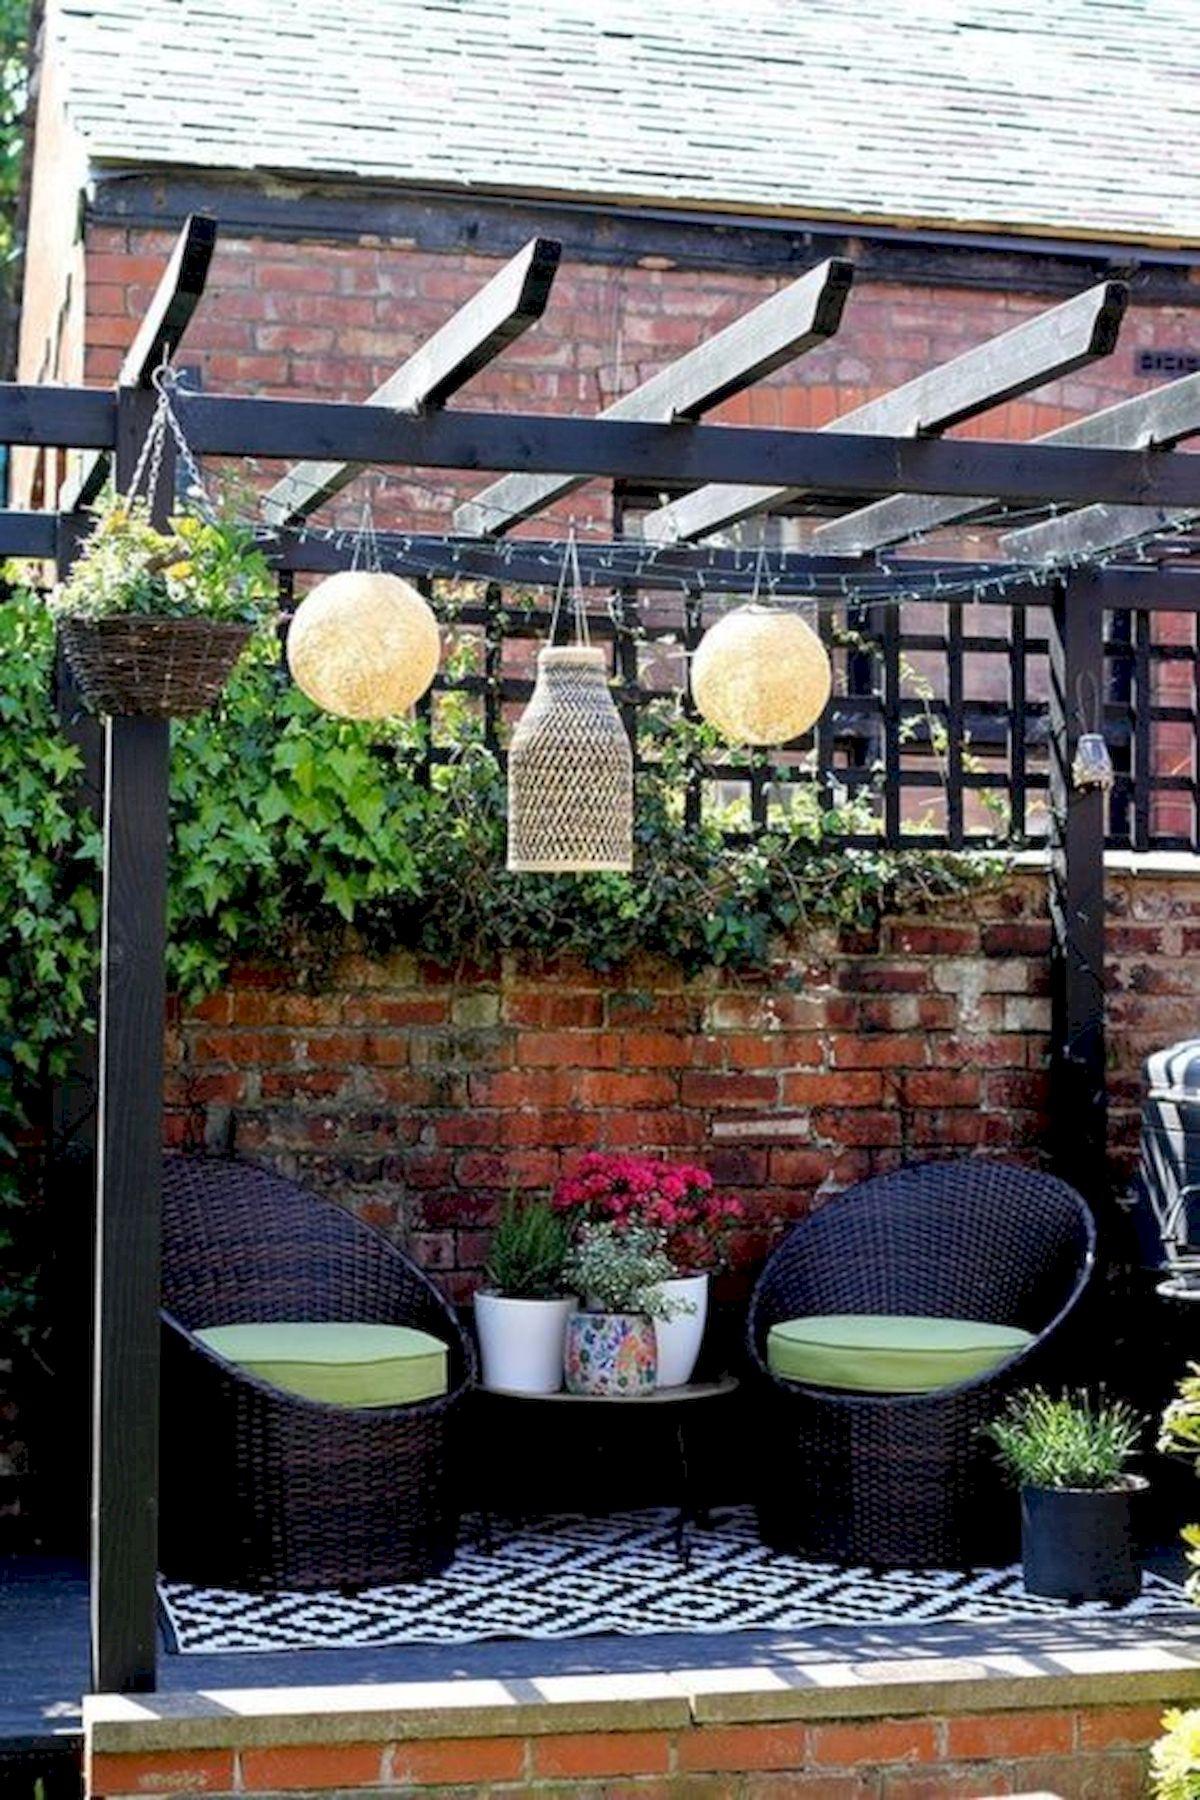 50 Awesome DIY Hanging Plants Ideas For Modern Backyard Garden (49)